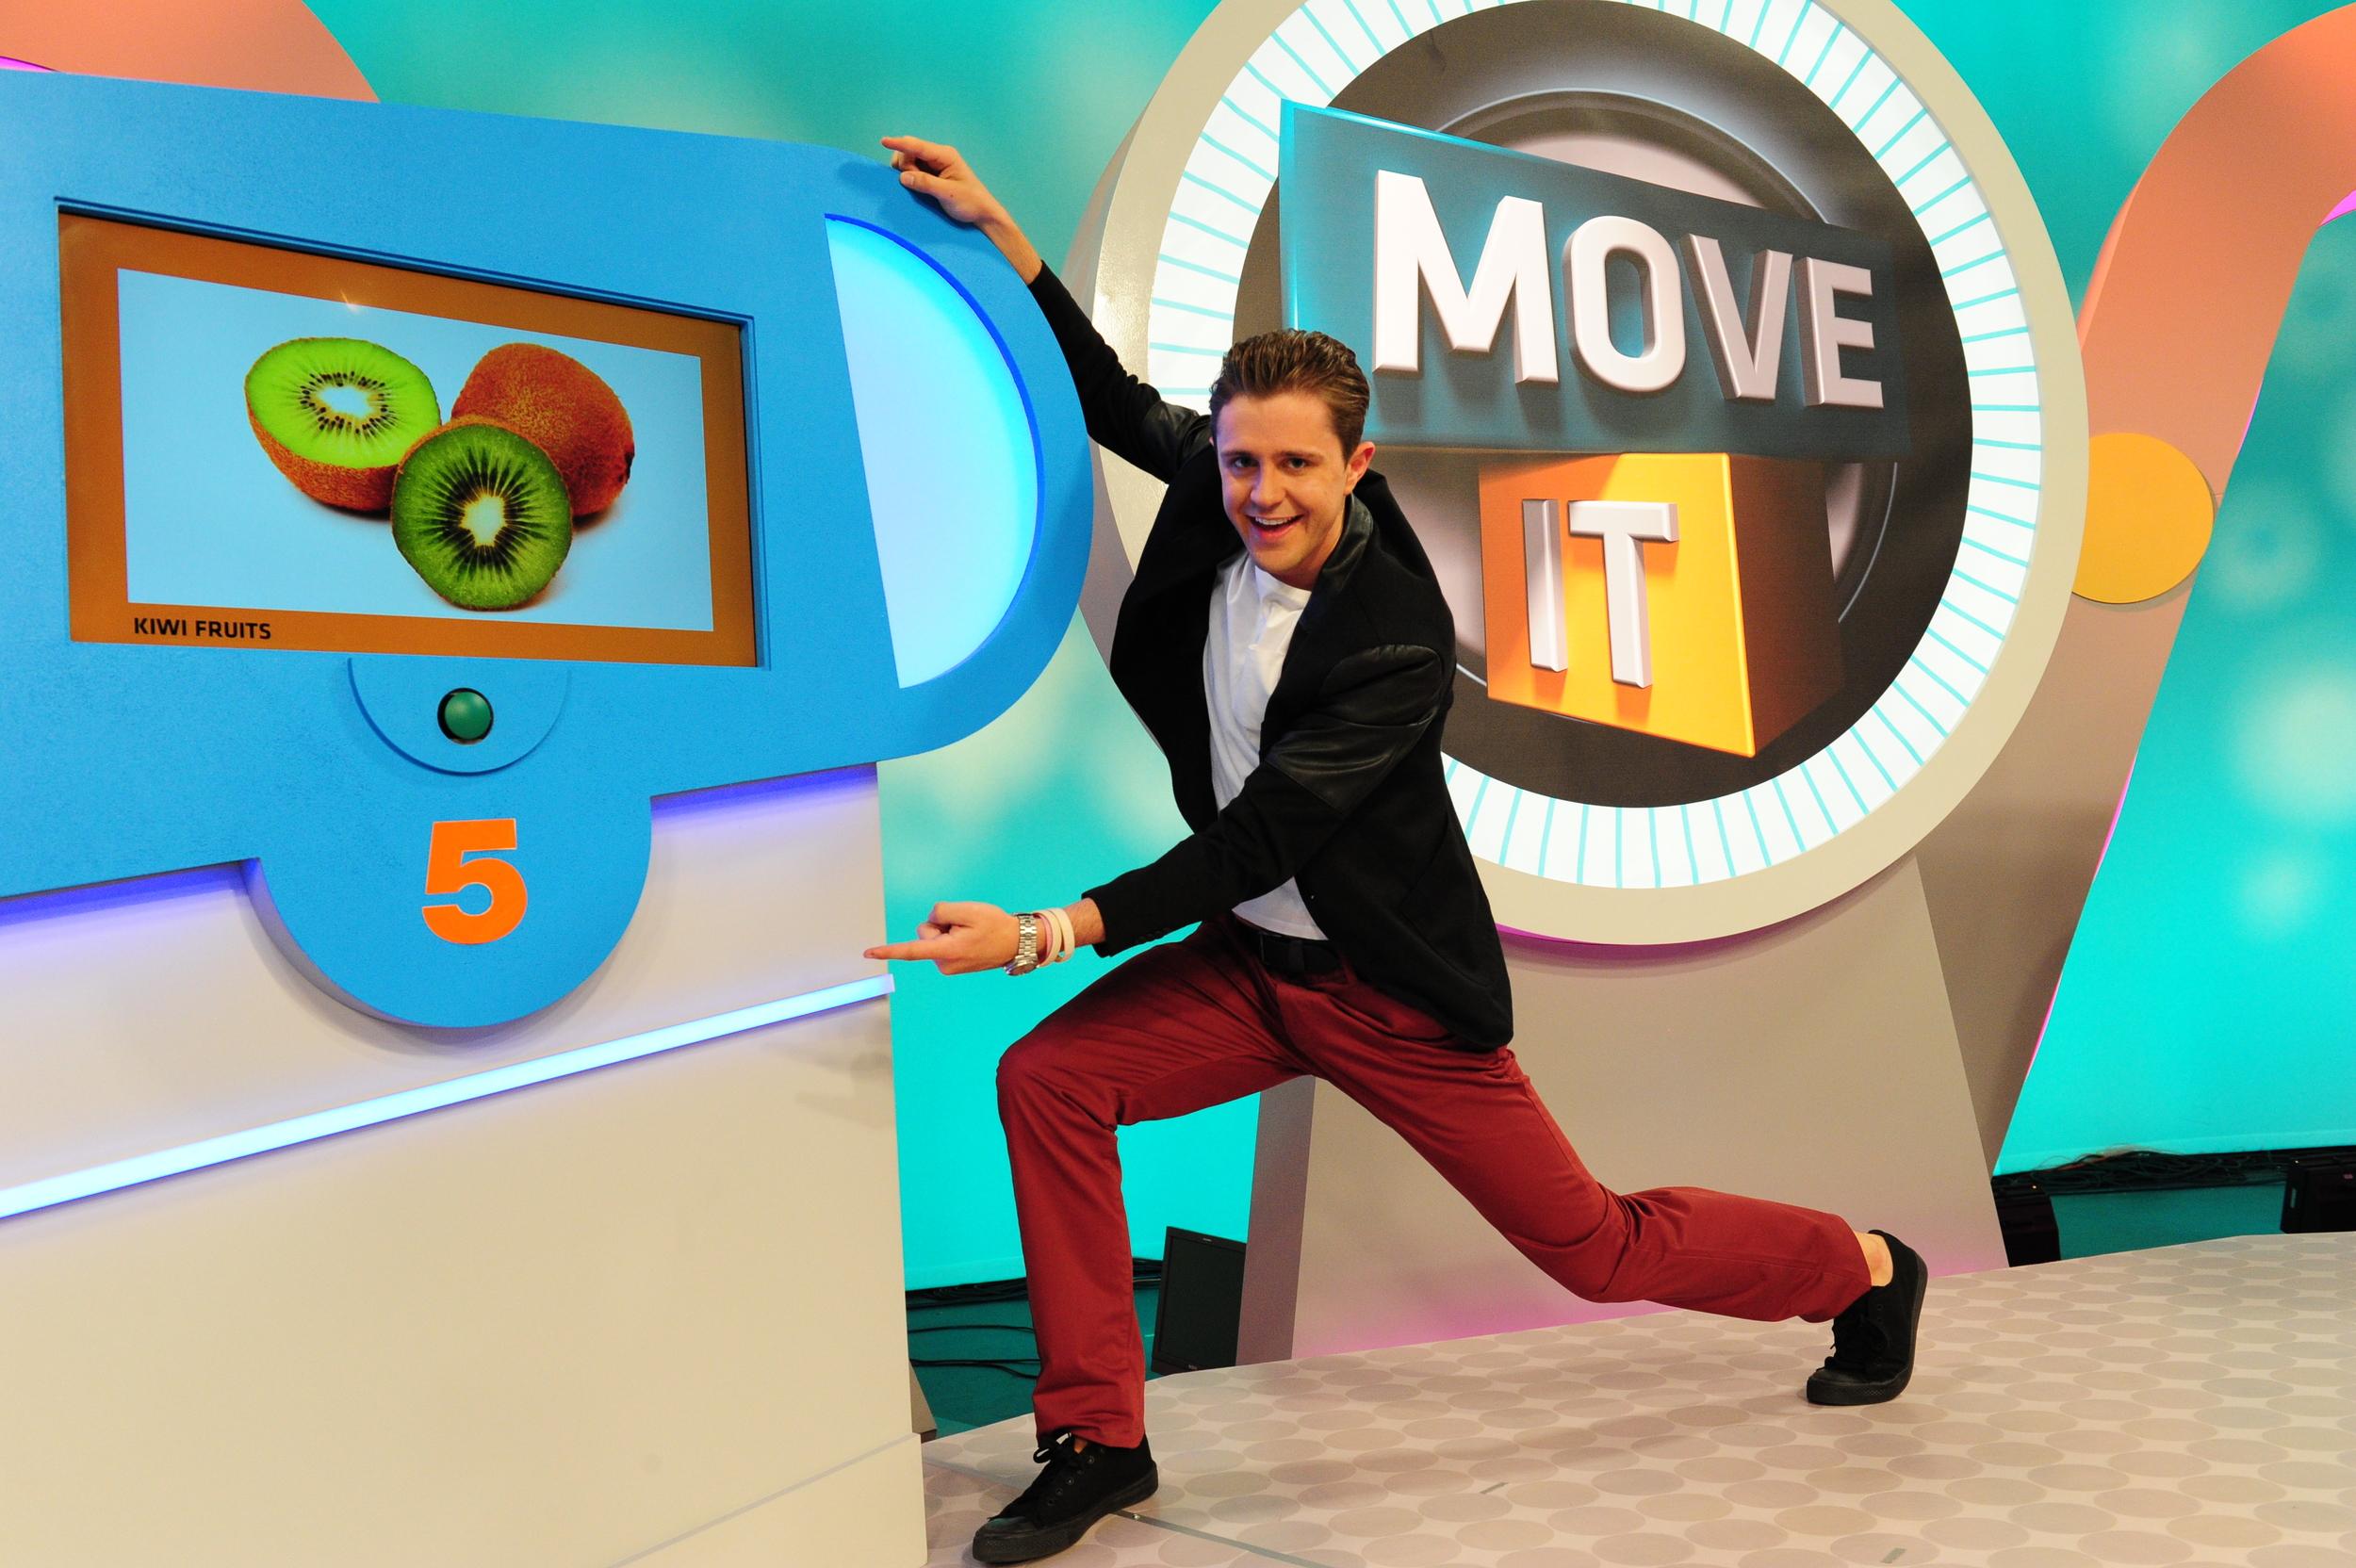 Move_It_Set_Still_17-ID-6128a7b8-7169-42f8-8a2d-4edba5857c7c.jpg